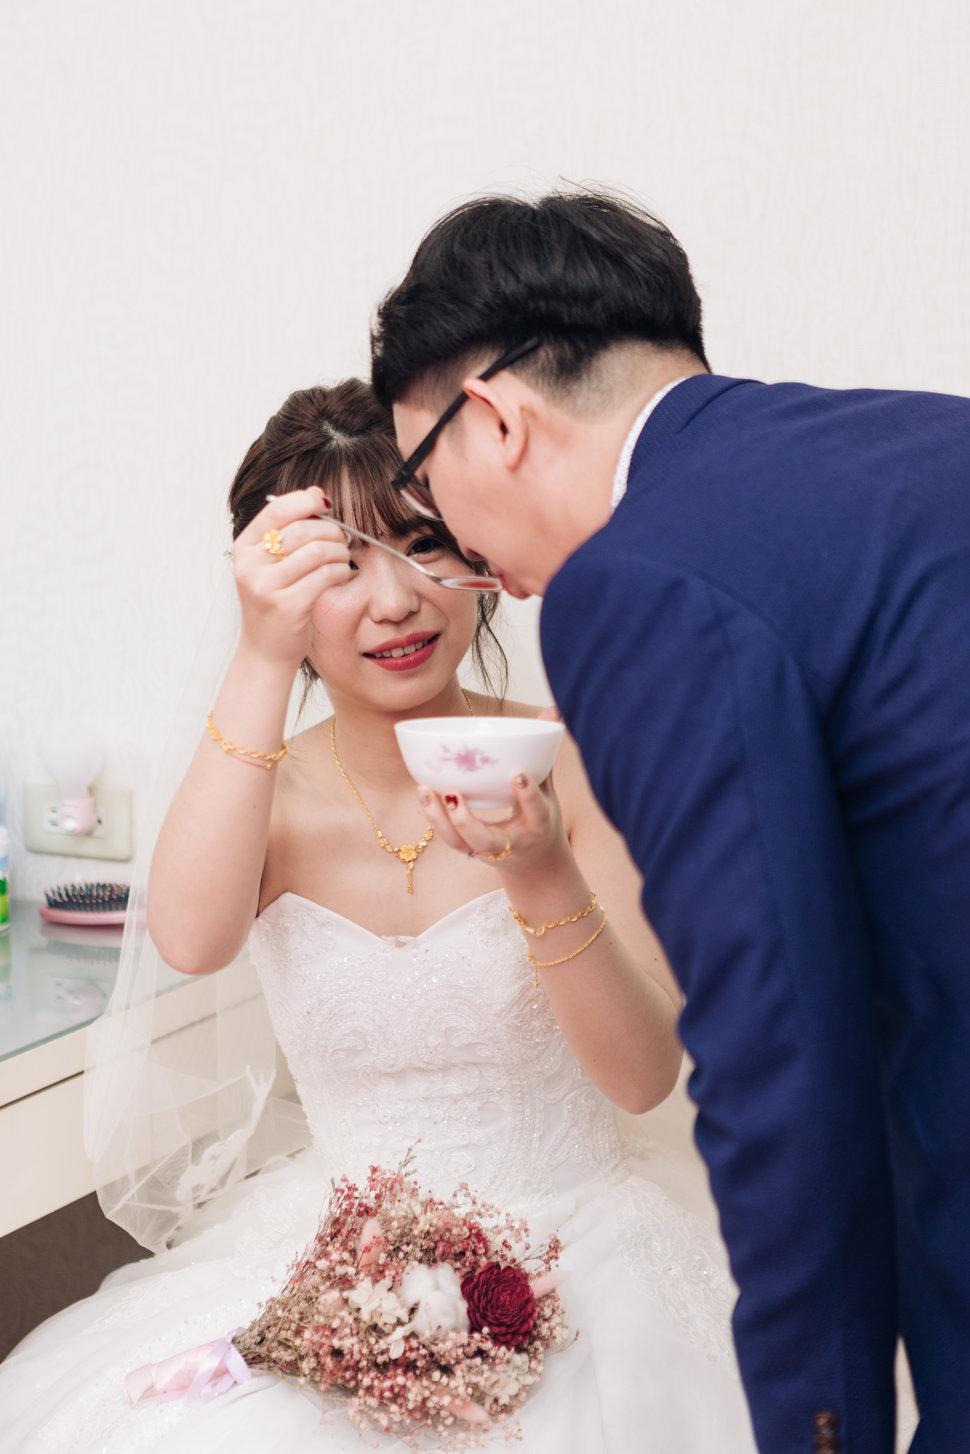 IMG_9193 - syuan影像紀錄 - 結婚吧